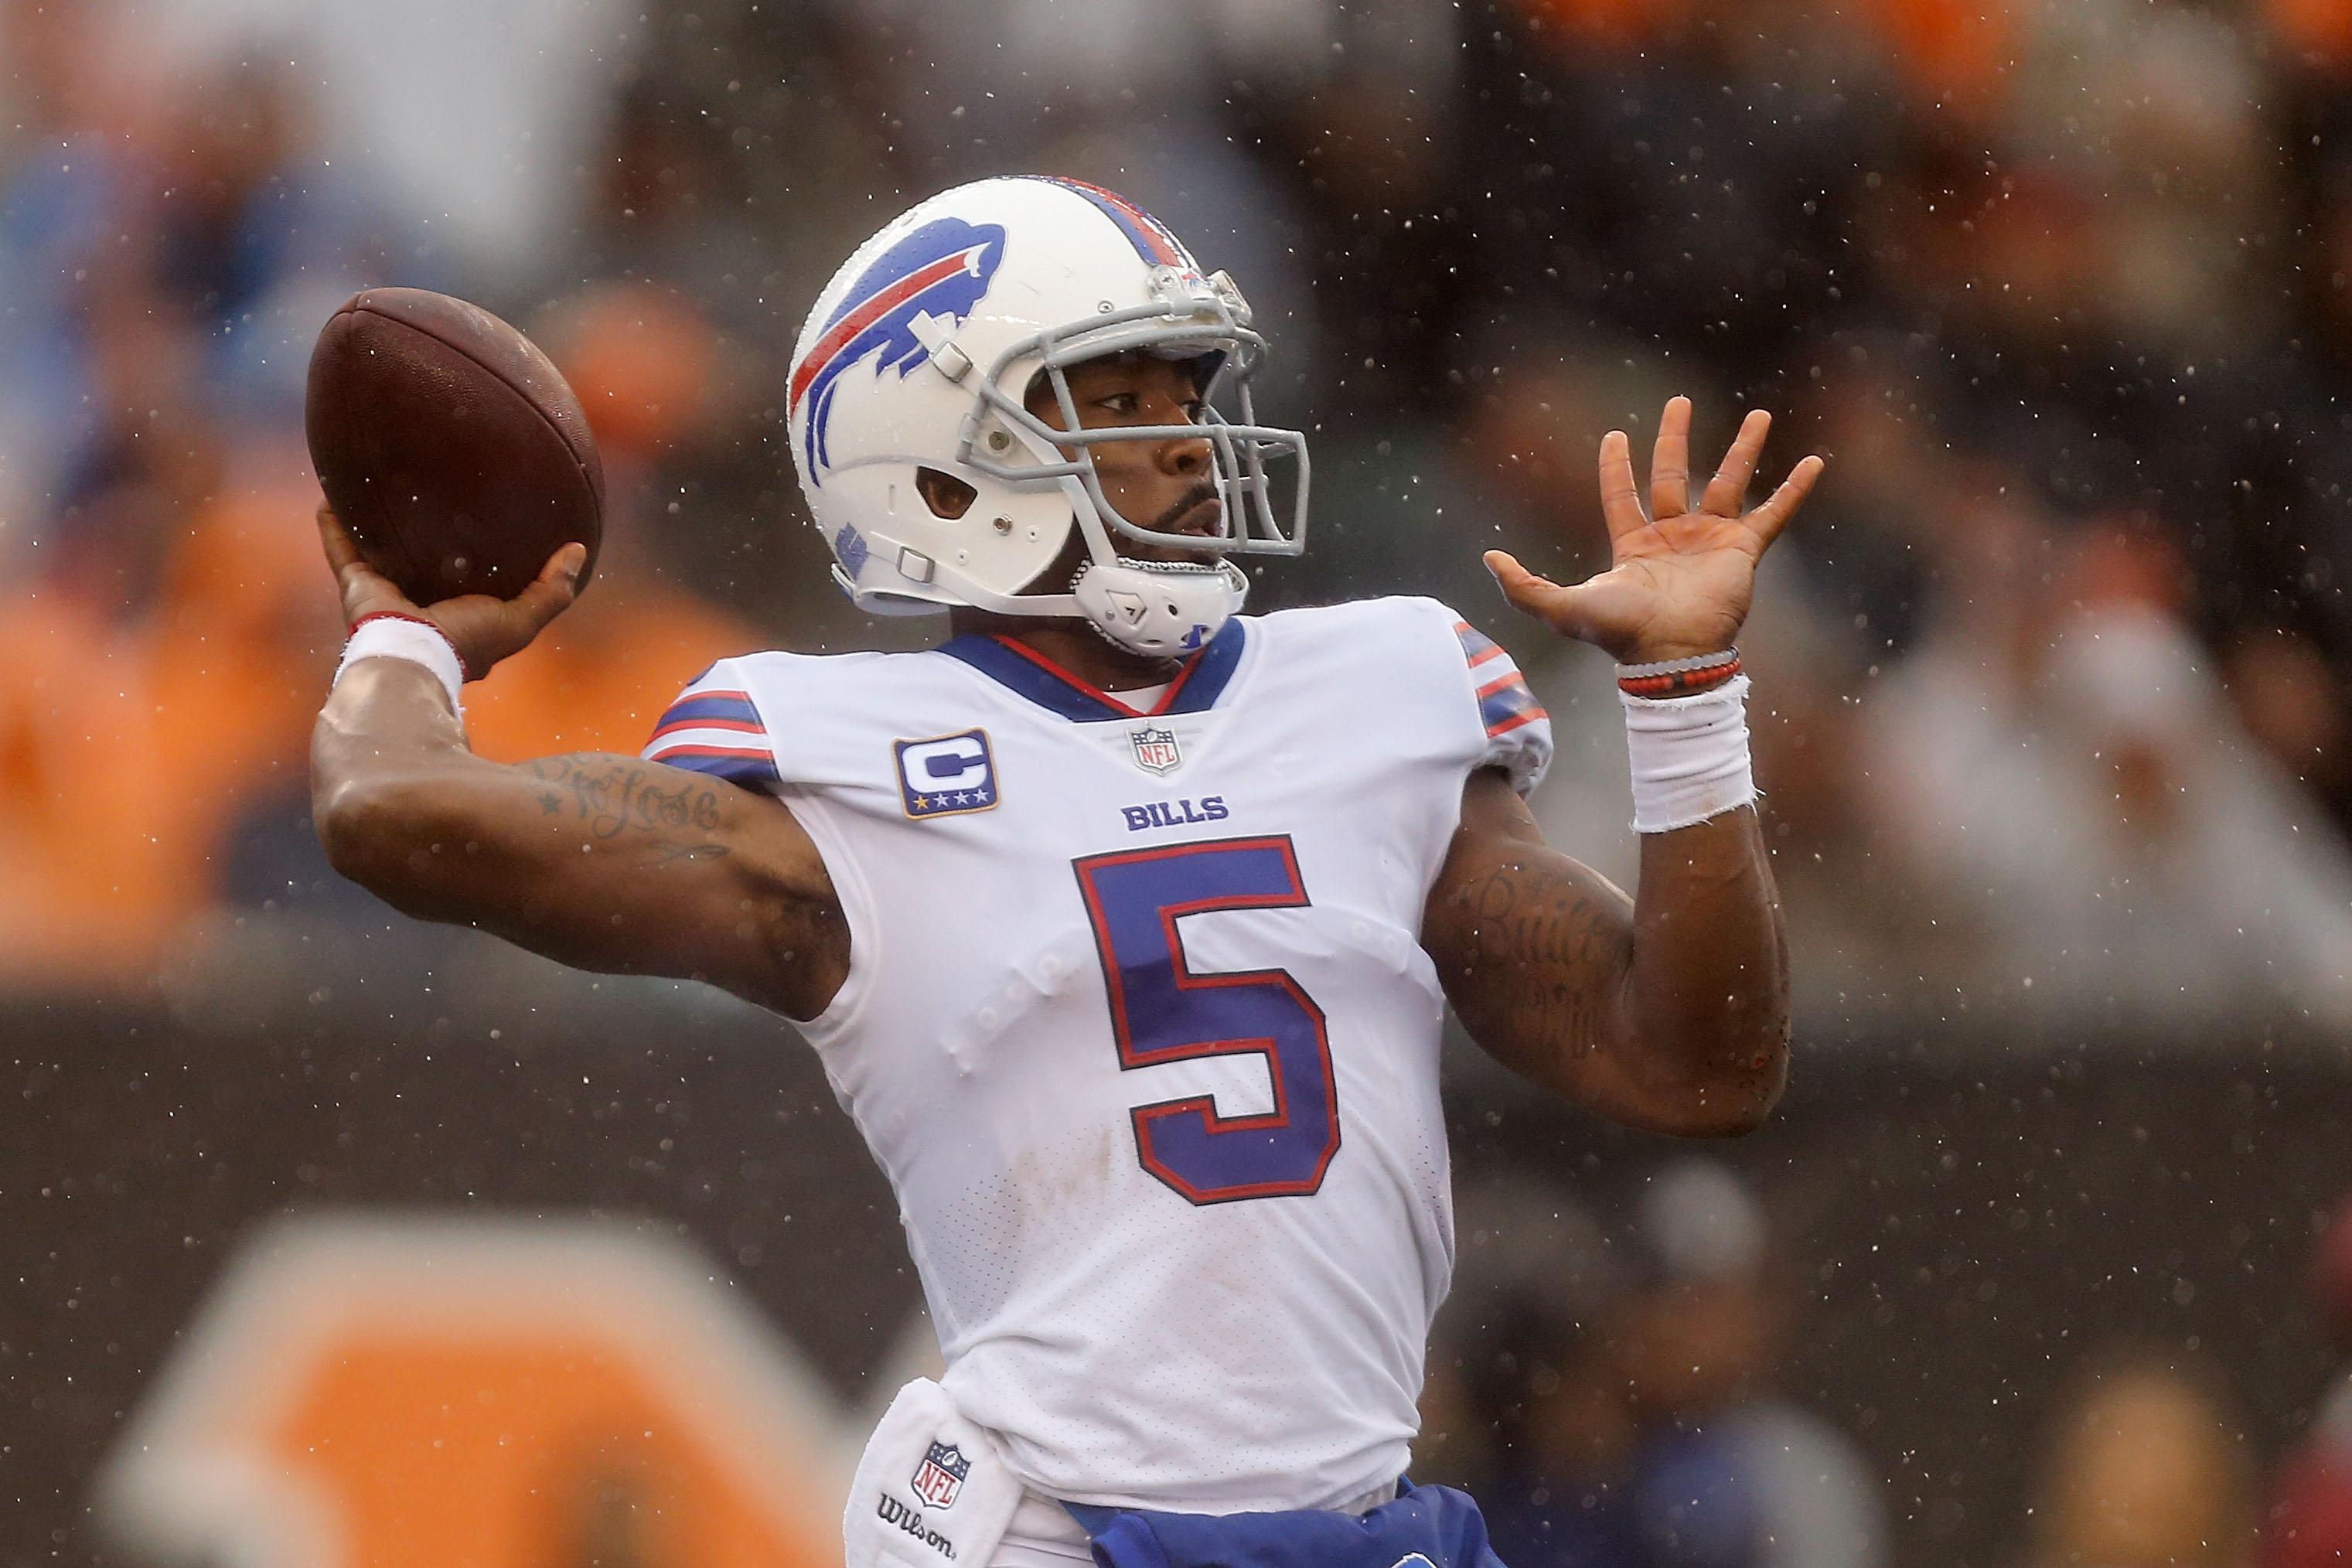 Buffalo Bills injury report: Jordan Matthews questionable for Week 7